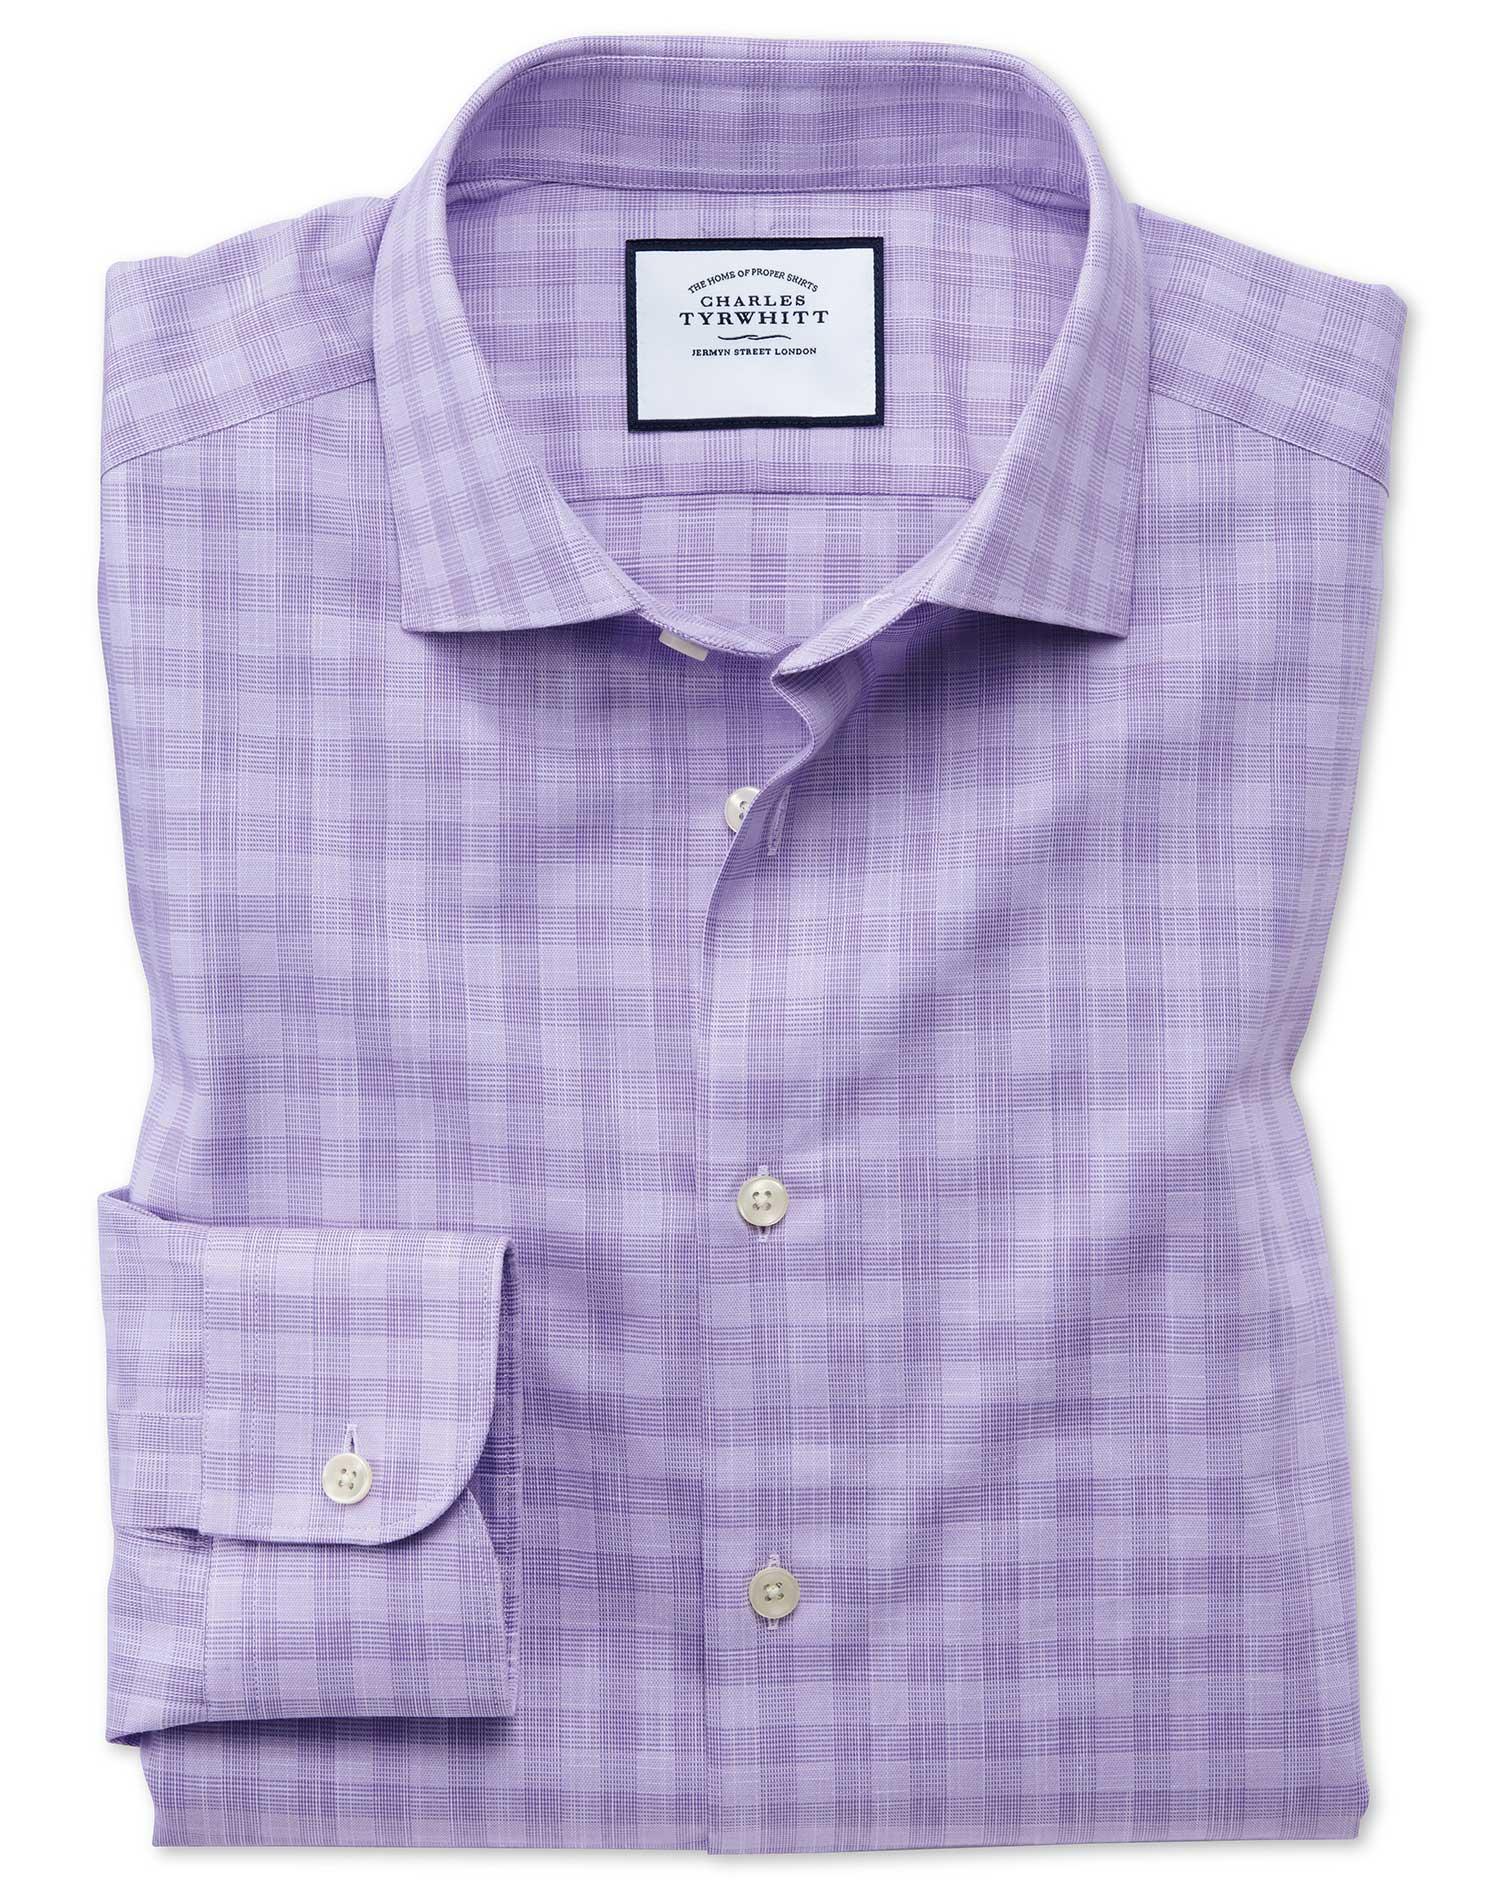 Extra Slim Fit Business Casual Egyptian Cotton Slub Lilac Check Formal Shirt Single Cuff Size 16/32